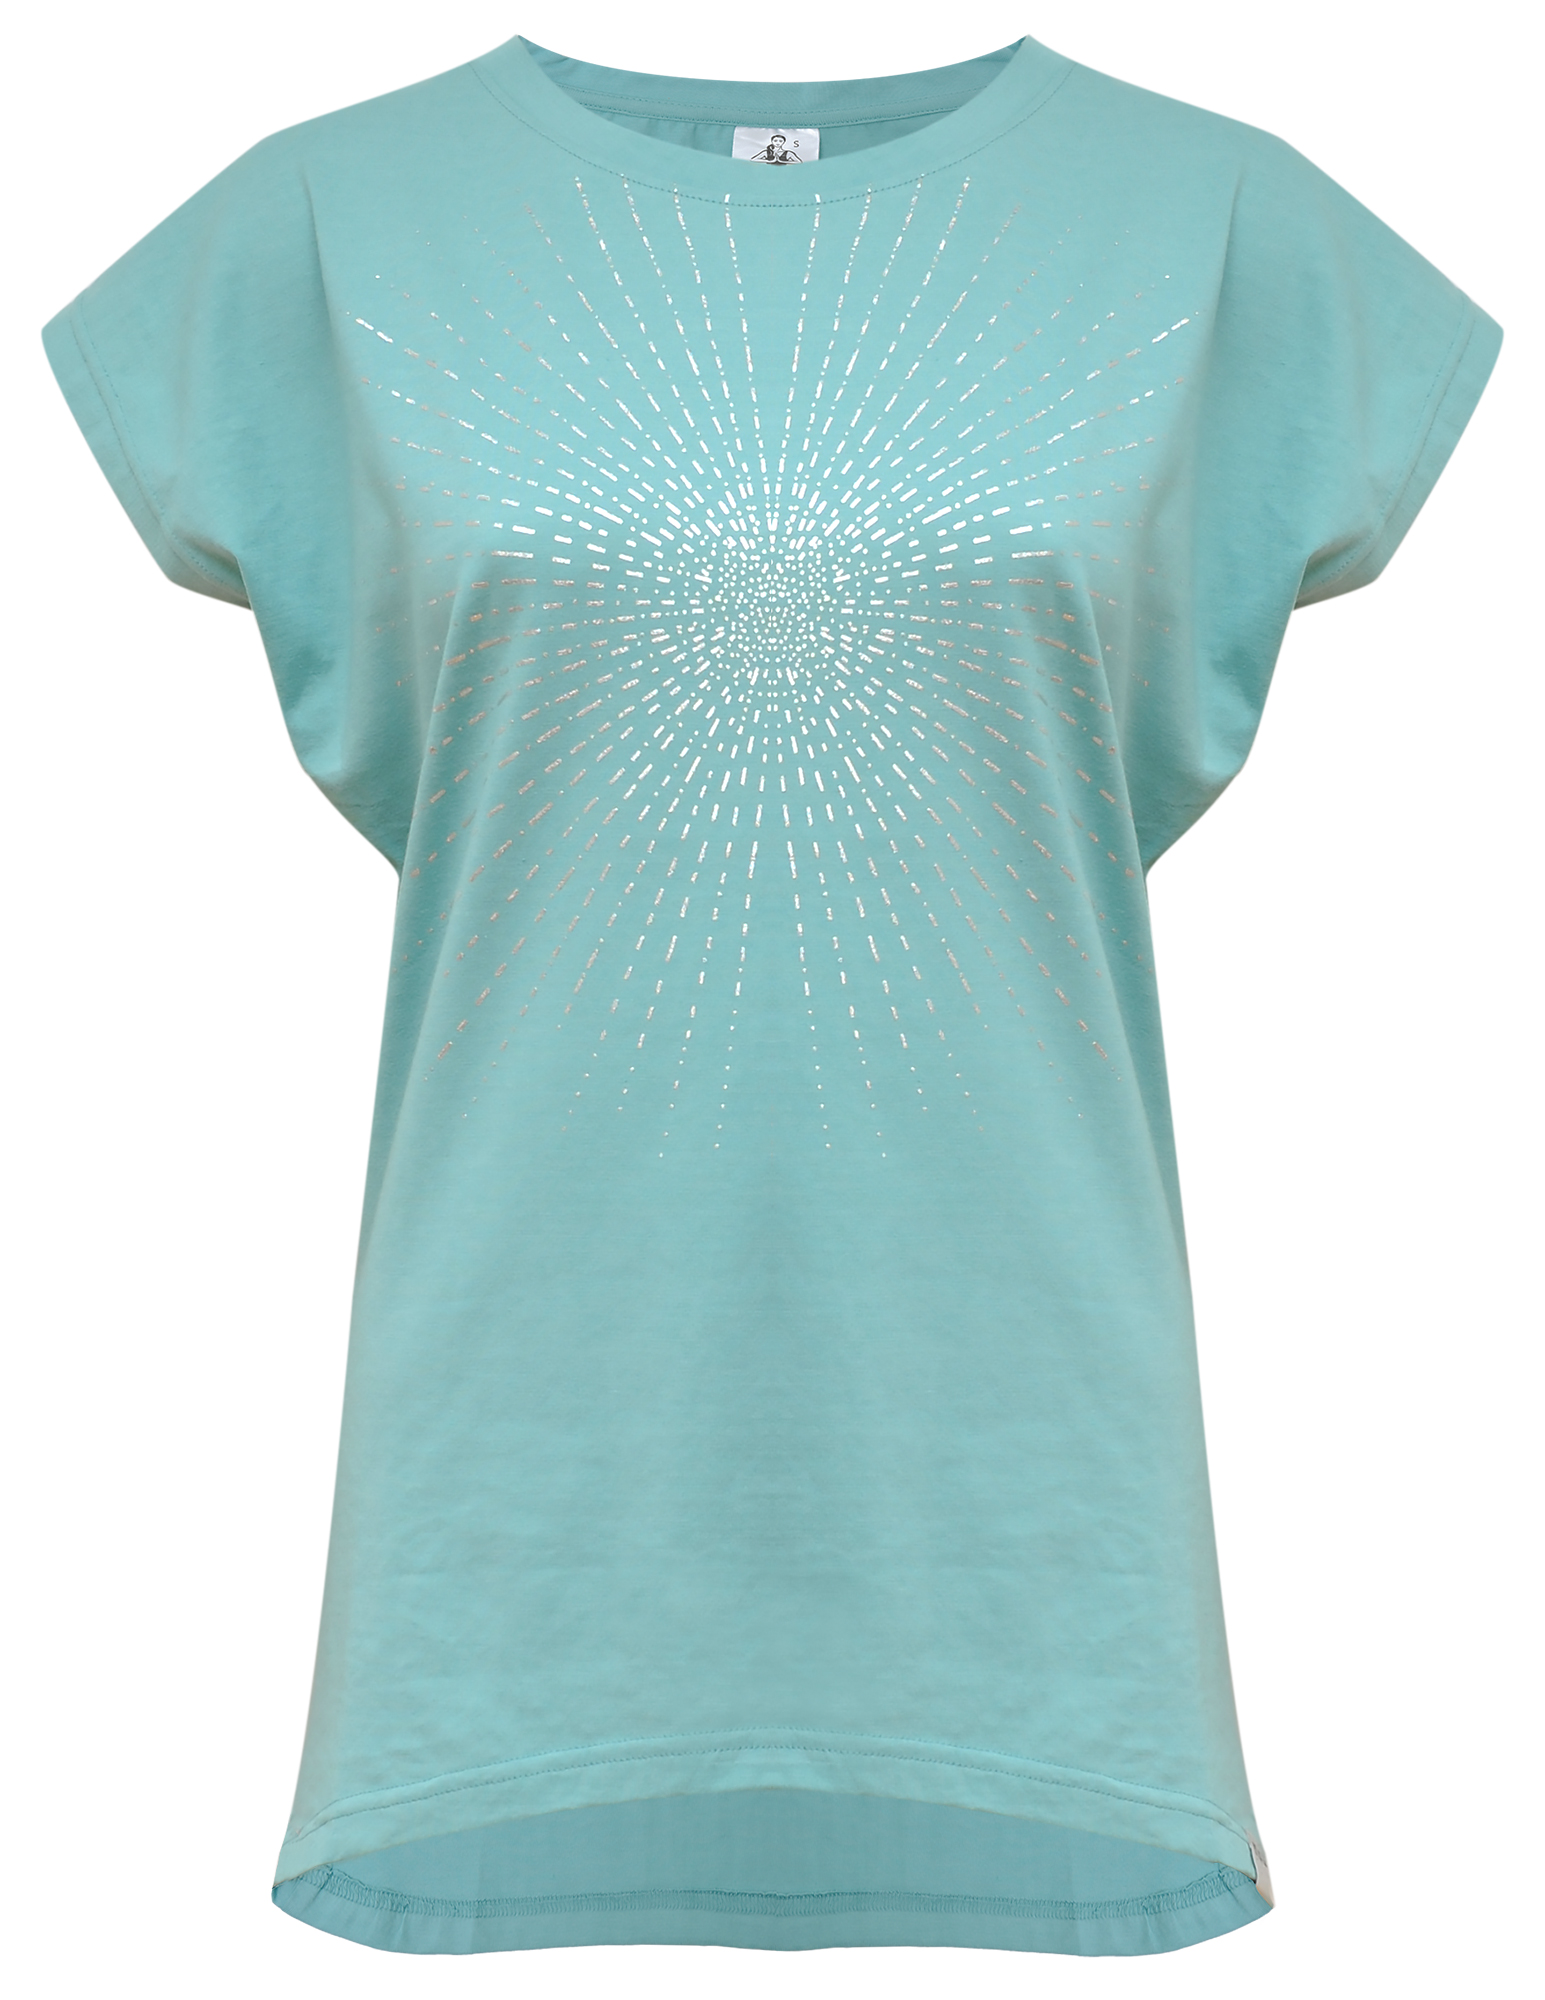 "Yoga-T-Shirt ""Batwing sunray"" - mint/silver"